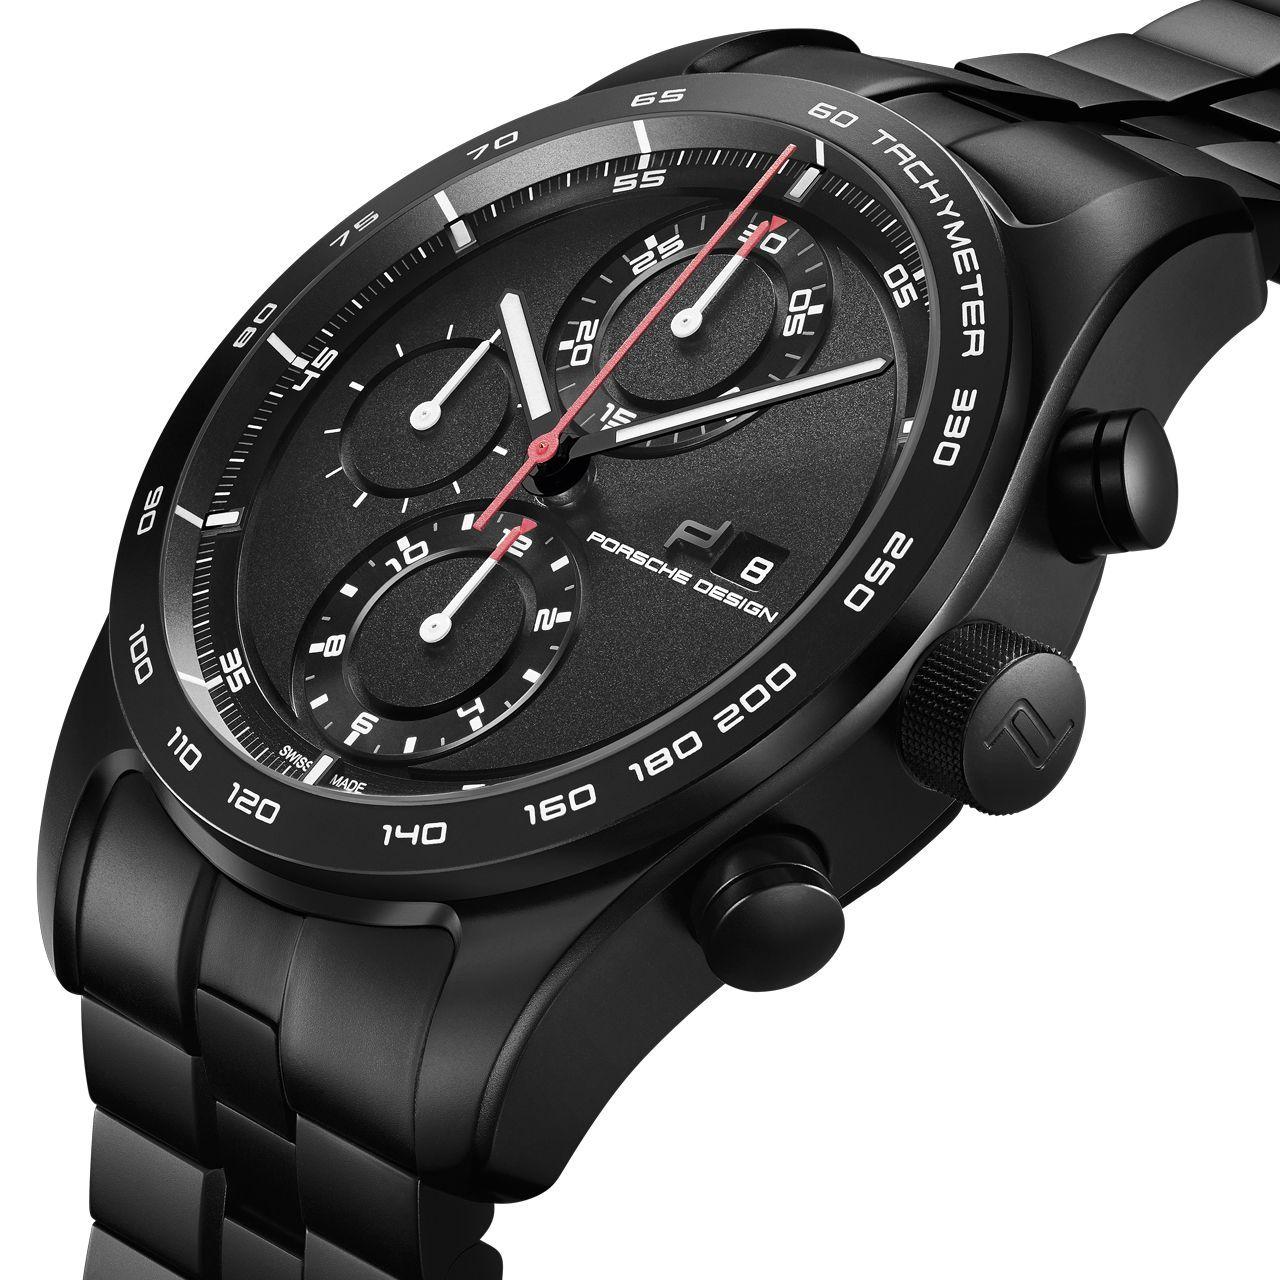 Montre Porsche Design Chronotimer Series 1 Matte Black vue 5